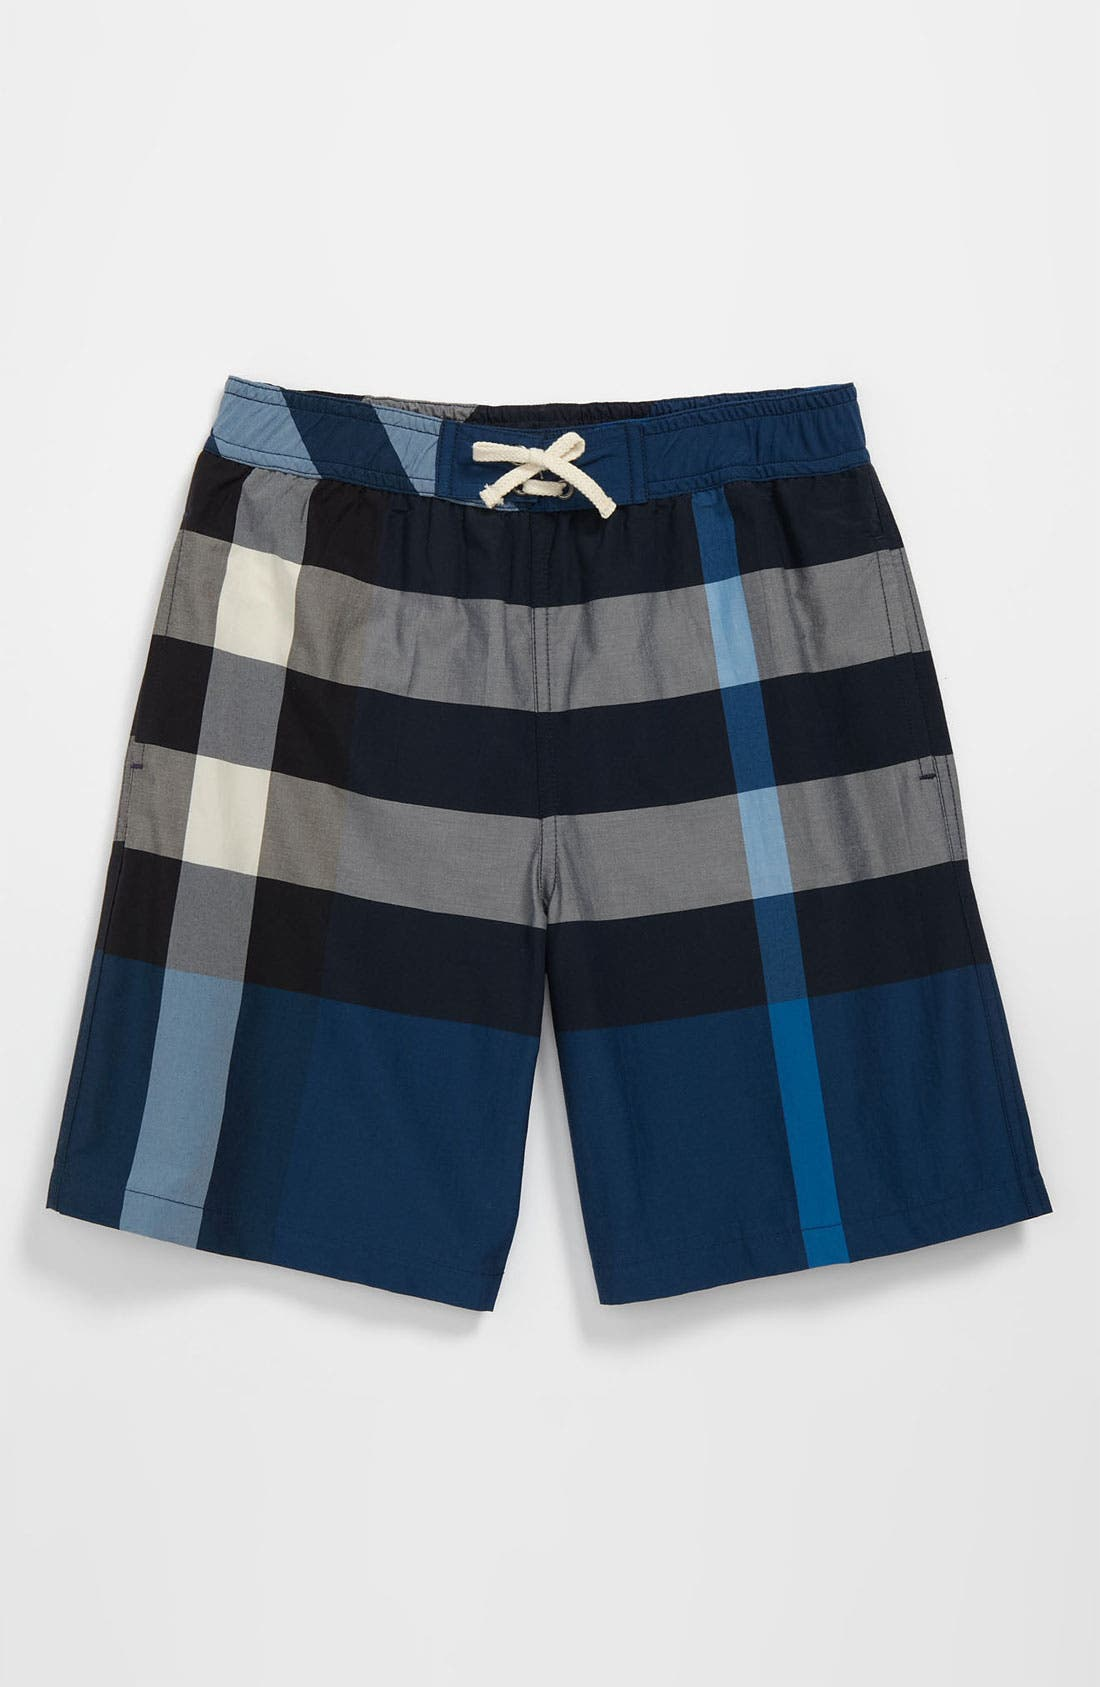 Alternate Image 1 Selected - Burberry 'Mini Jeffries' Swim Shorts (Little Boys & Big Boys)